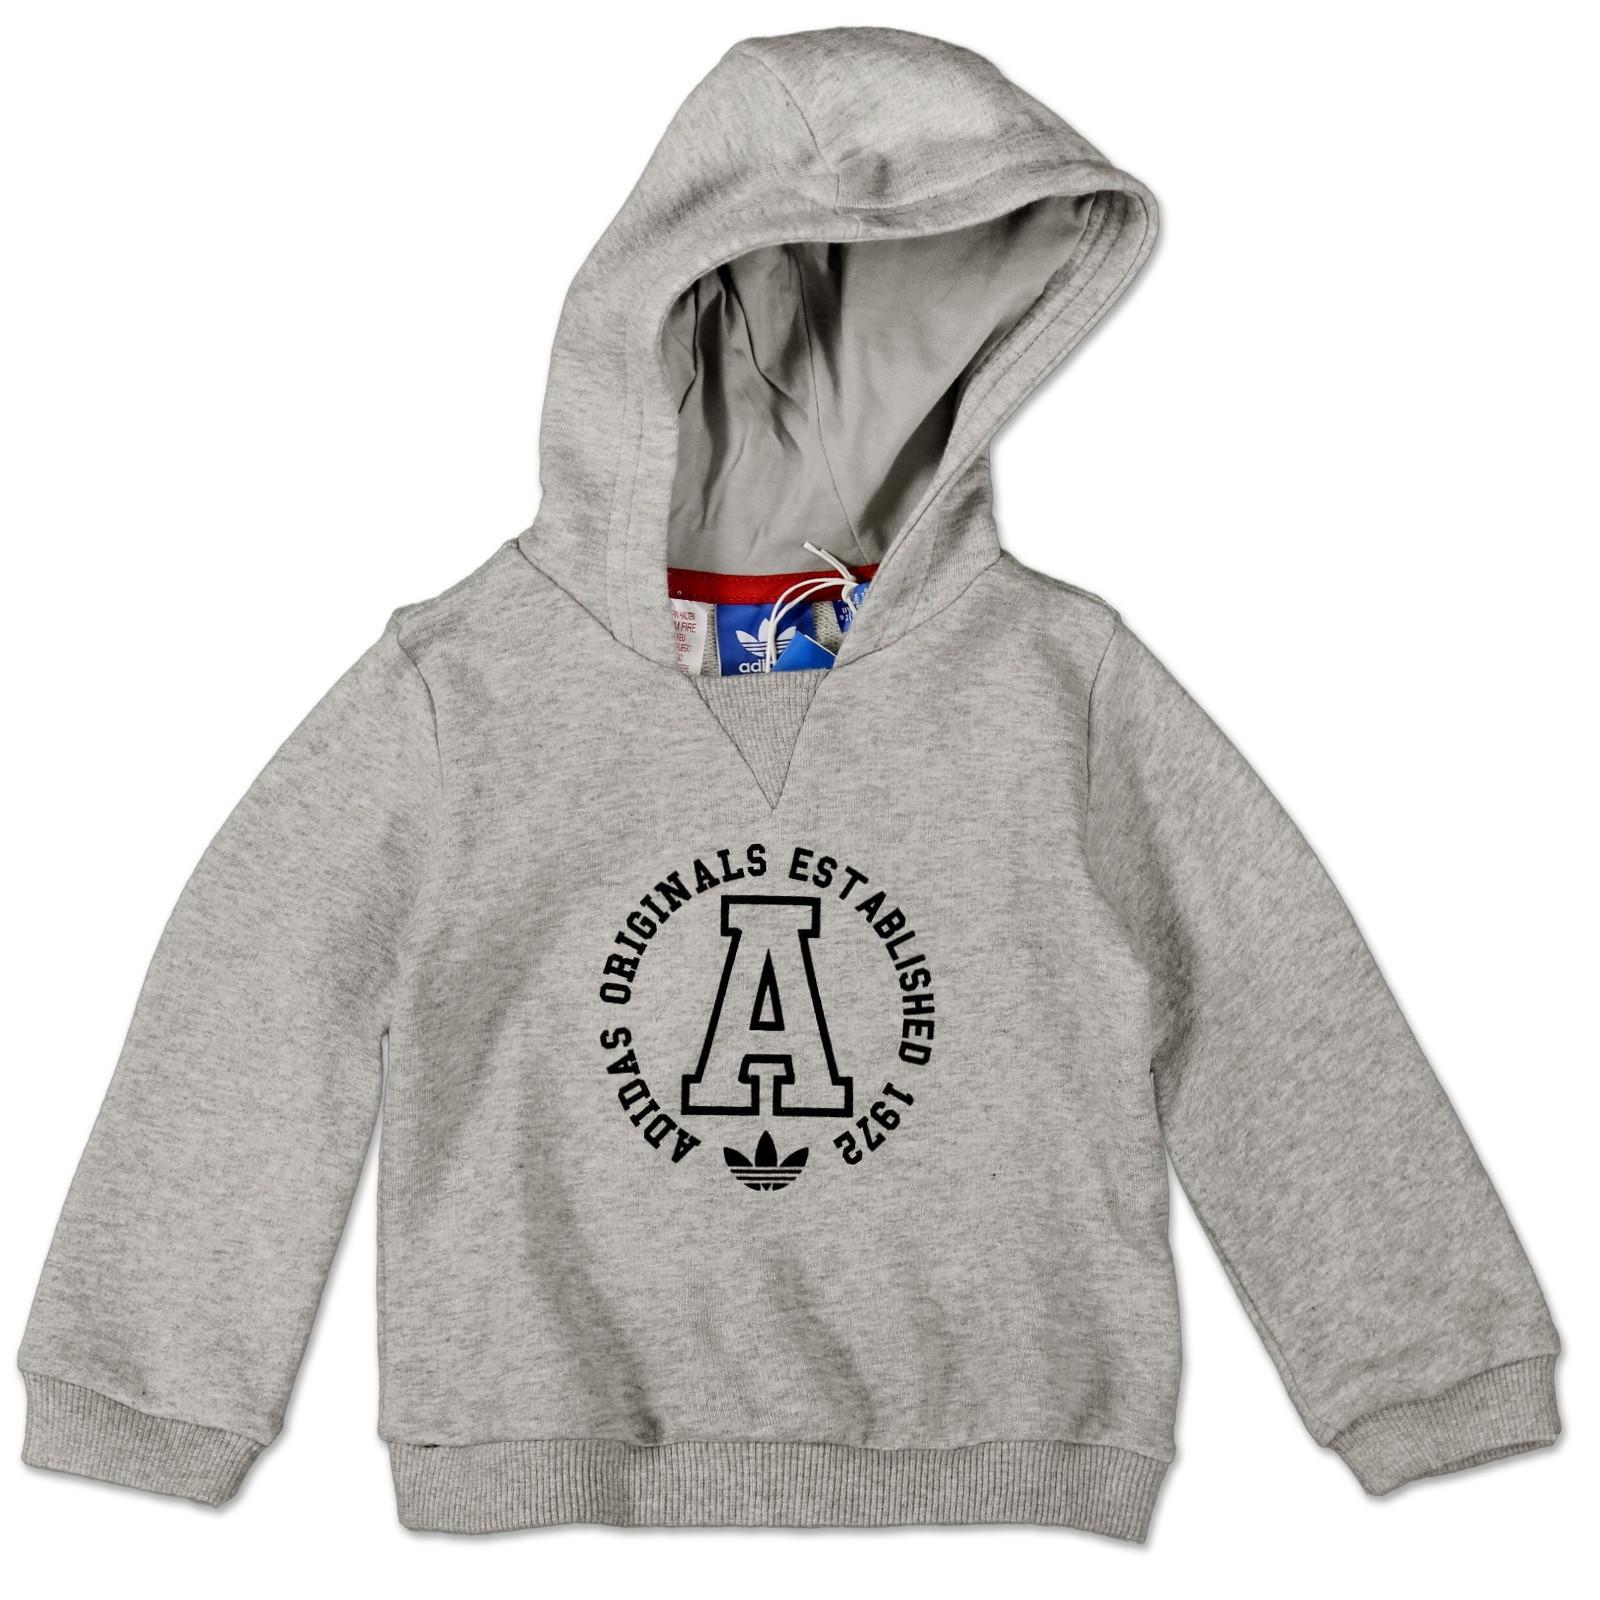 adidas originals kinder kapuzen pullover hoodie sweatshirt trefoil hoody grau kinder jacken. Black Bedroom Furniture Sets. Home Design Ideas